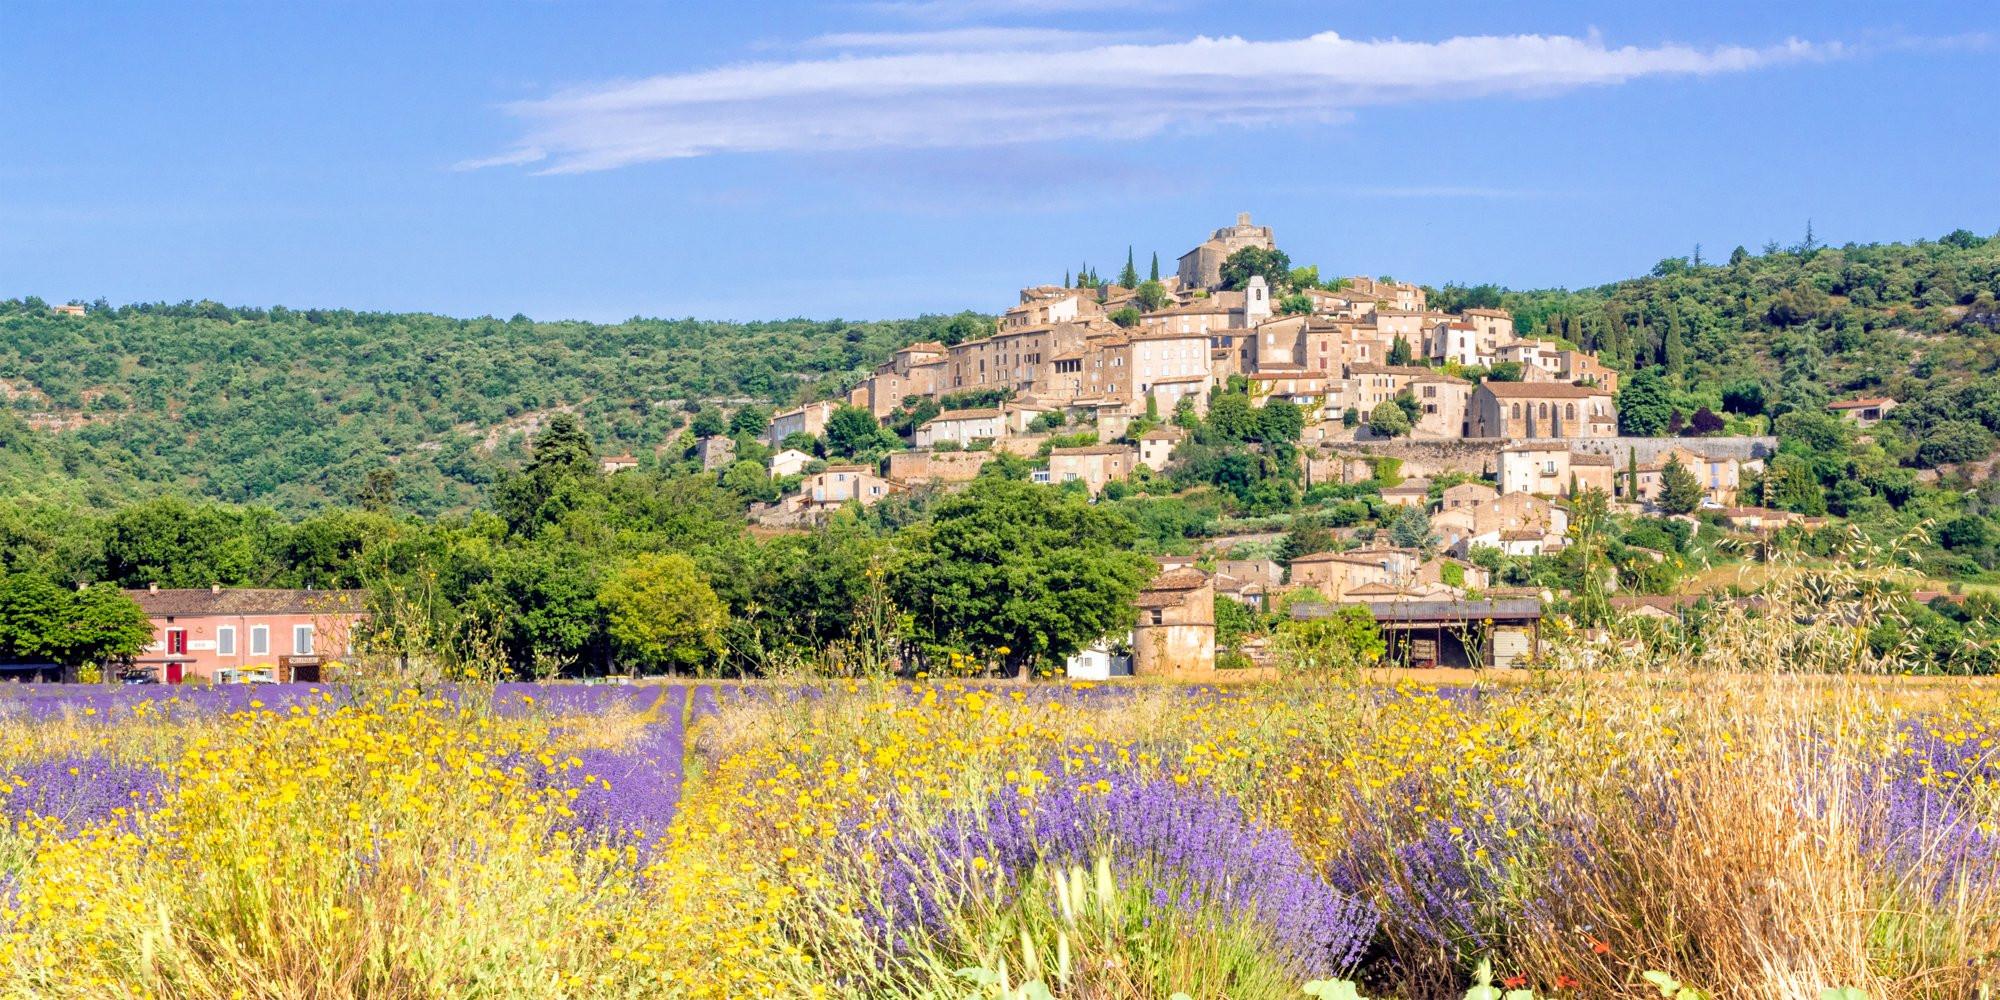 Simiane-la-Rotonde Provençal perch village in Vaucluse France